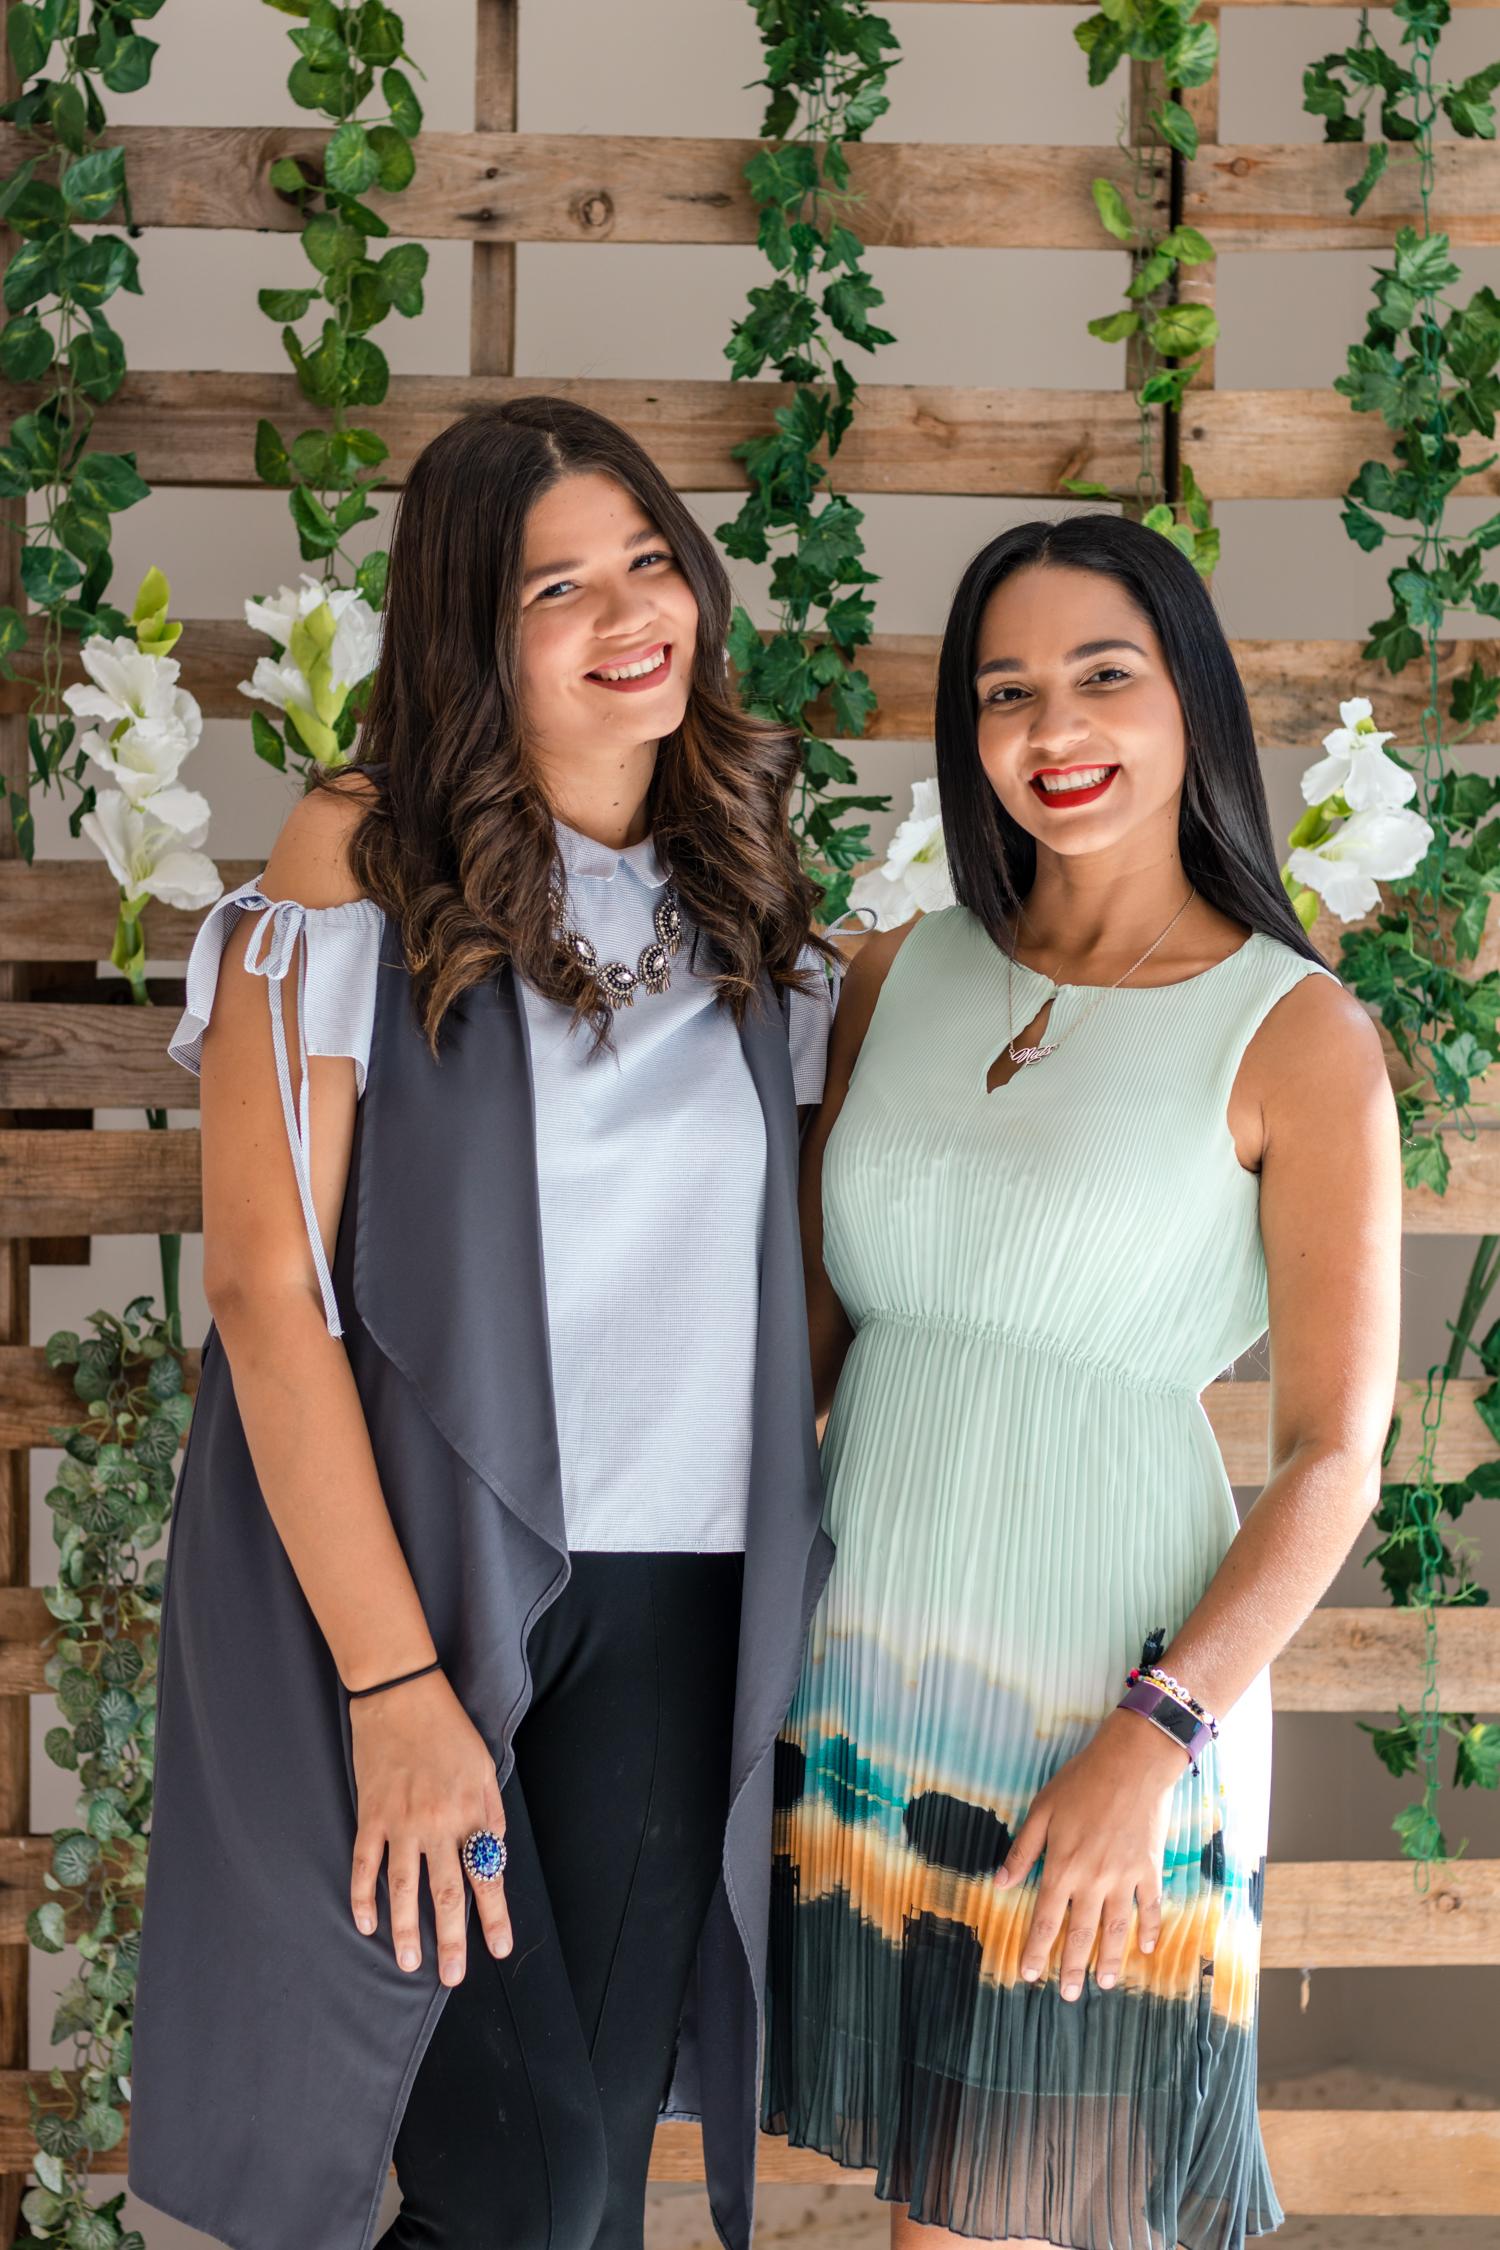 Mariela y Nathalia Medina - Creadoras del Curso Online sobre Fotografia - The Key To Social Photos